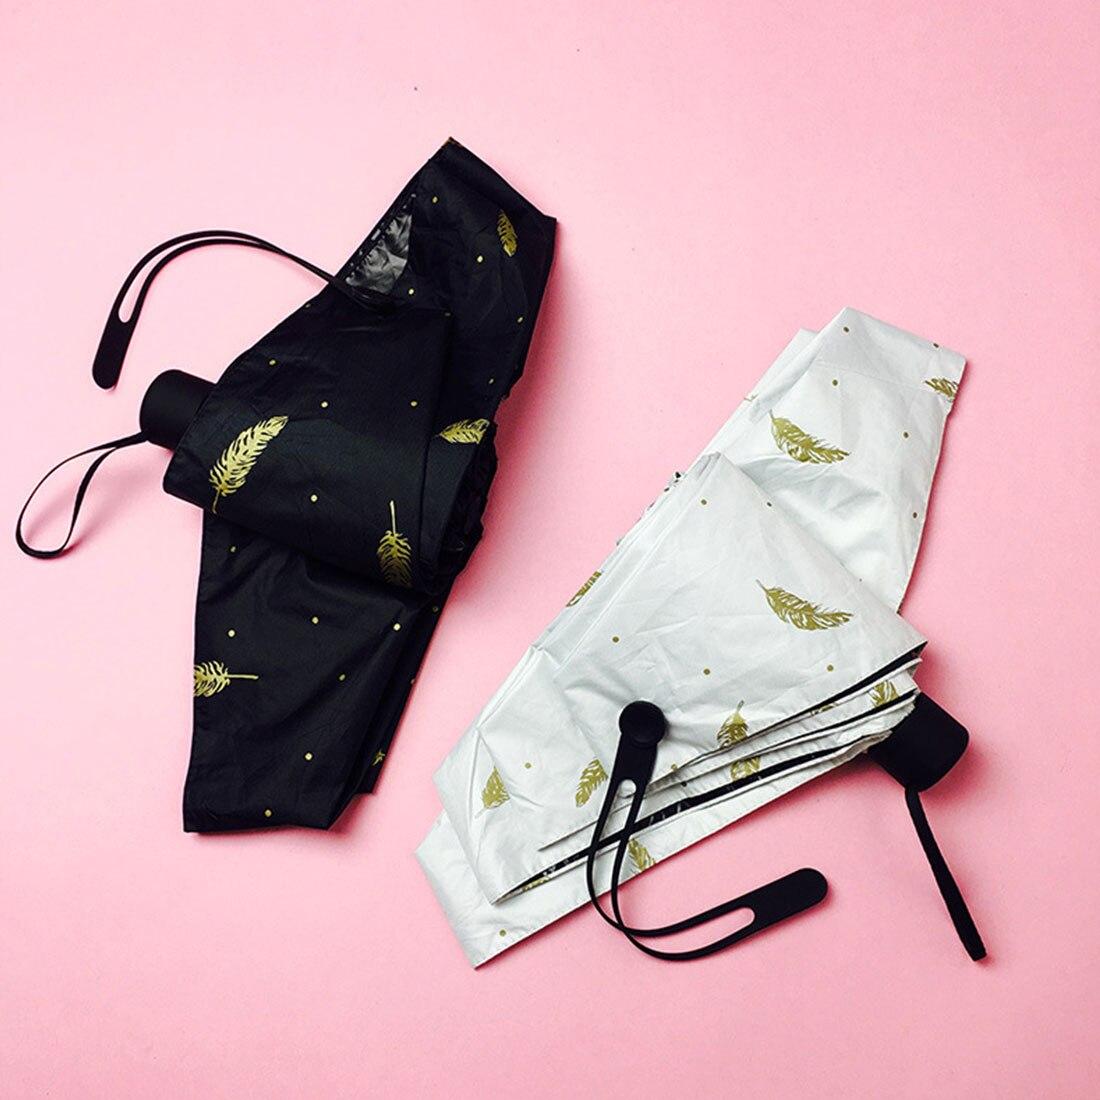 Pequeno cinco dobrável lápis guarda-chuva ultra-fino luz mini guarda-chuva chuva feminino guarda-chuva para homens sol chuva engrenagem guarda-sol